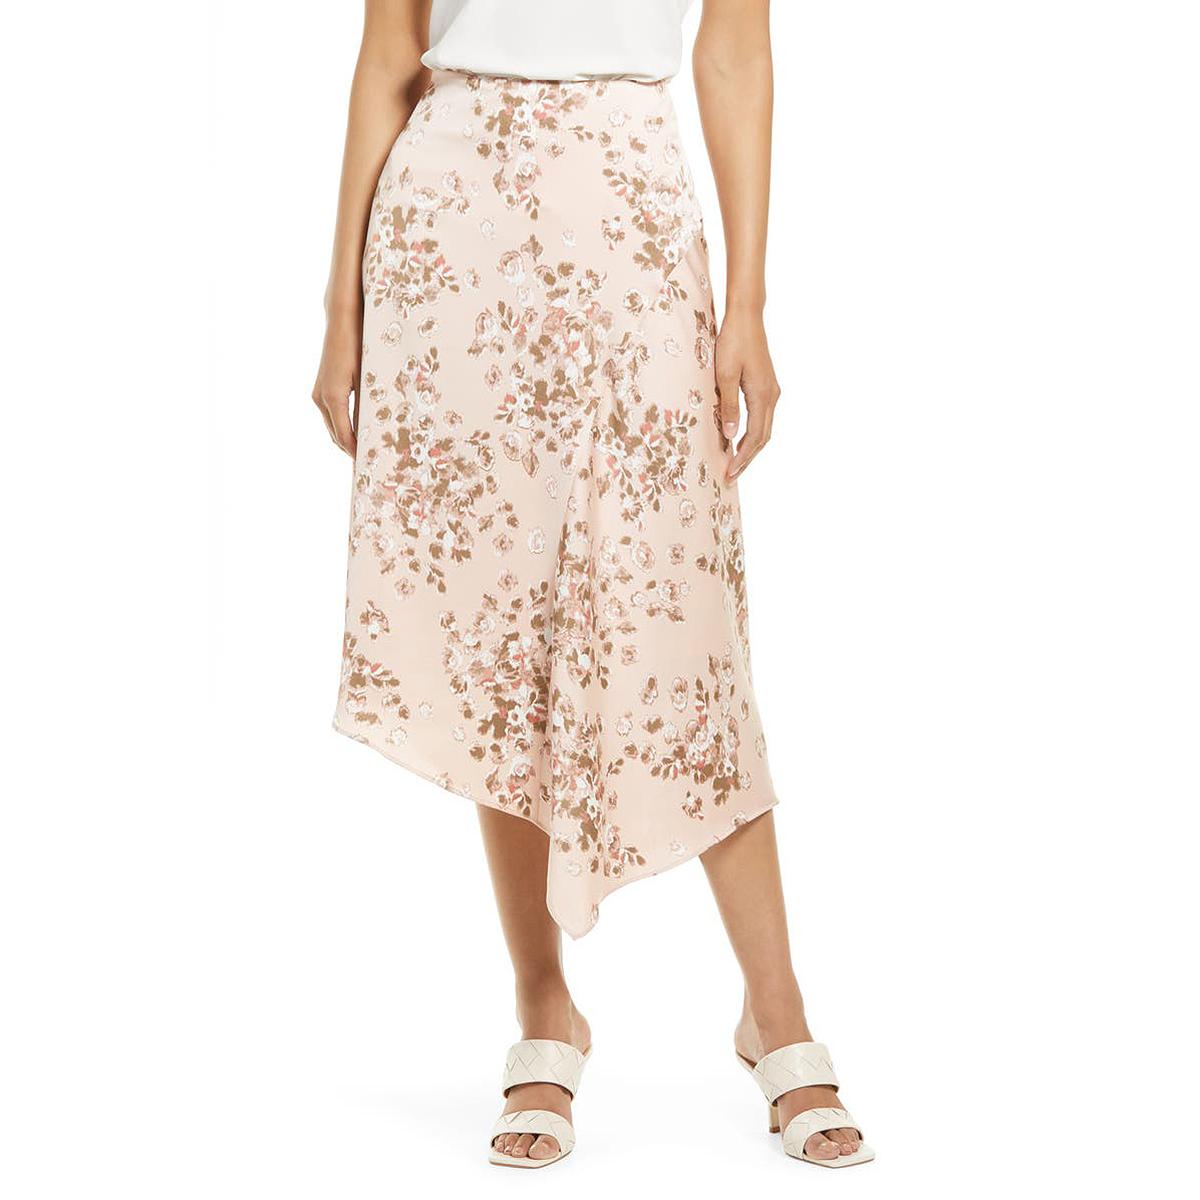 nordstrom-anniversary-sale-asymmetric-skirt